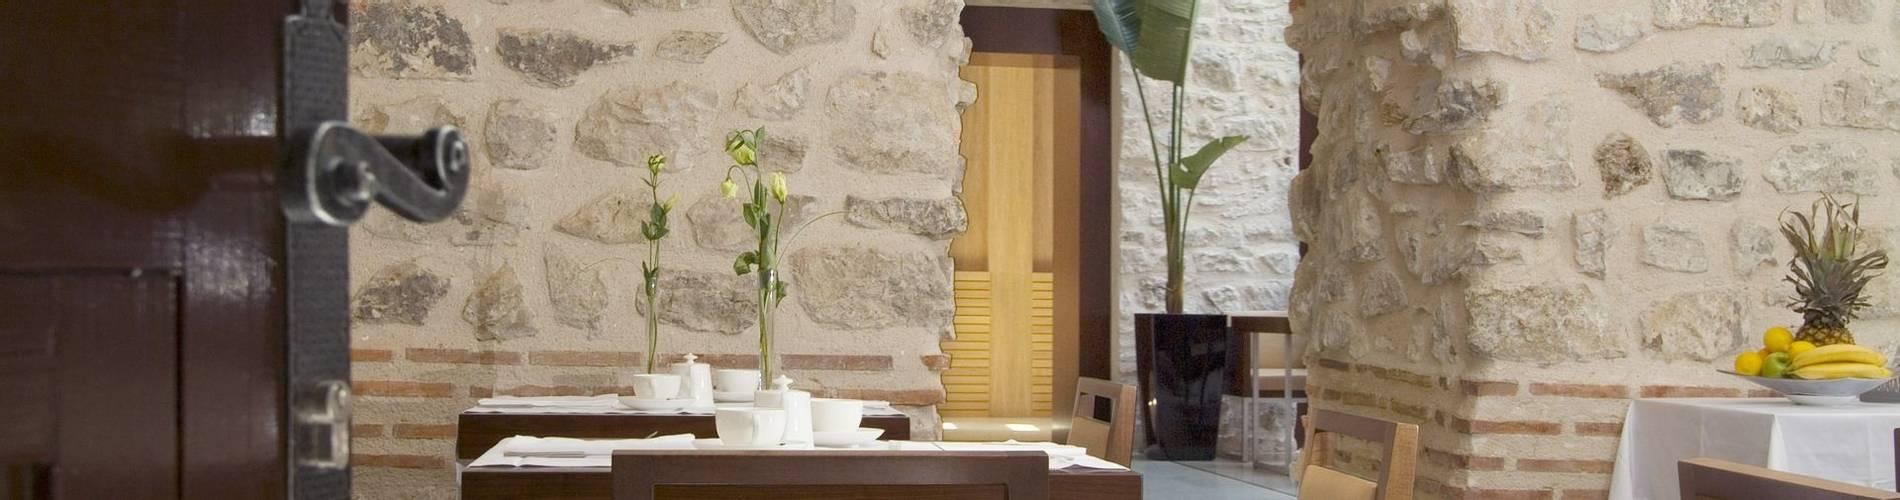 hotel vestibul palace split restaurant.jpg